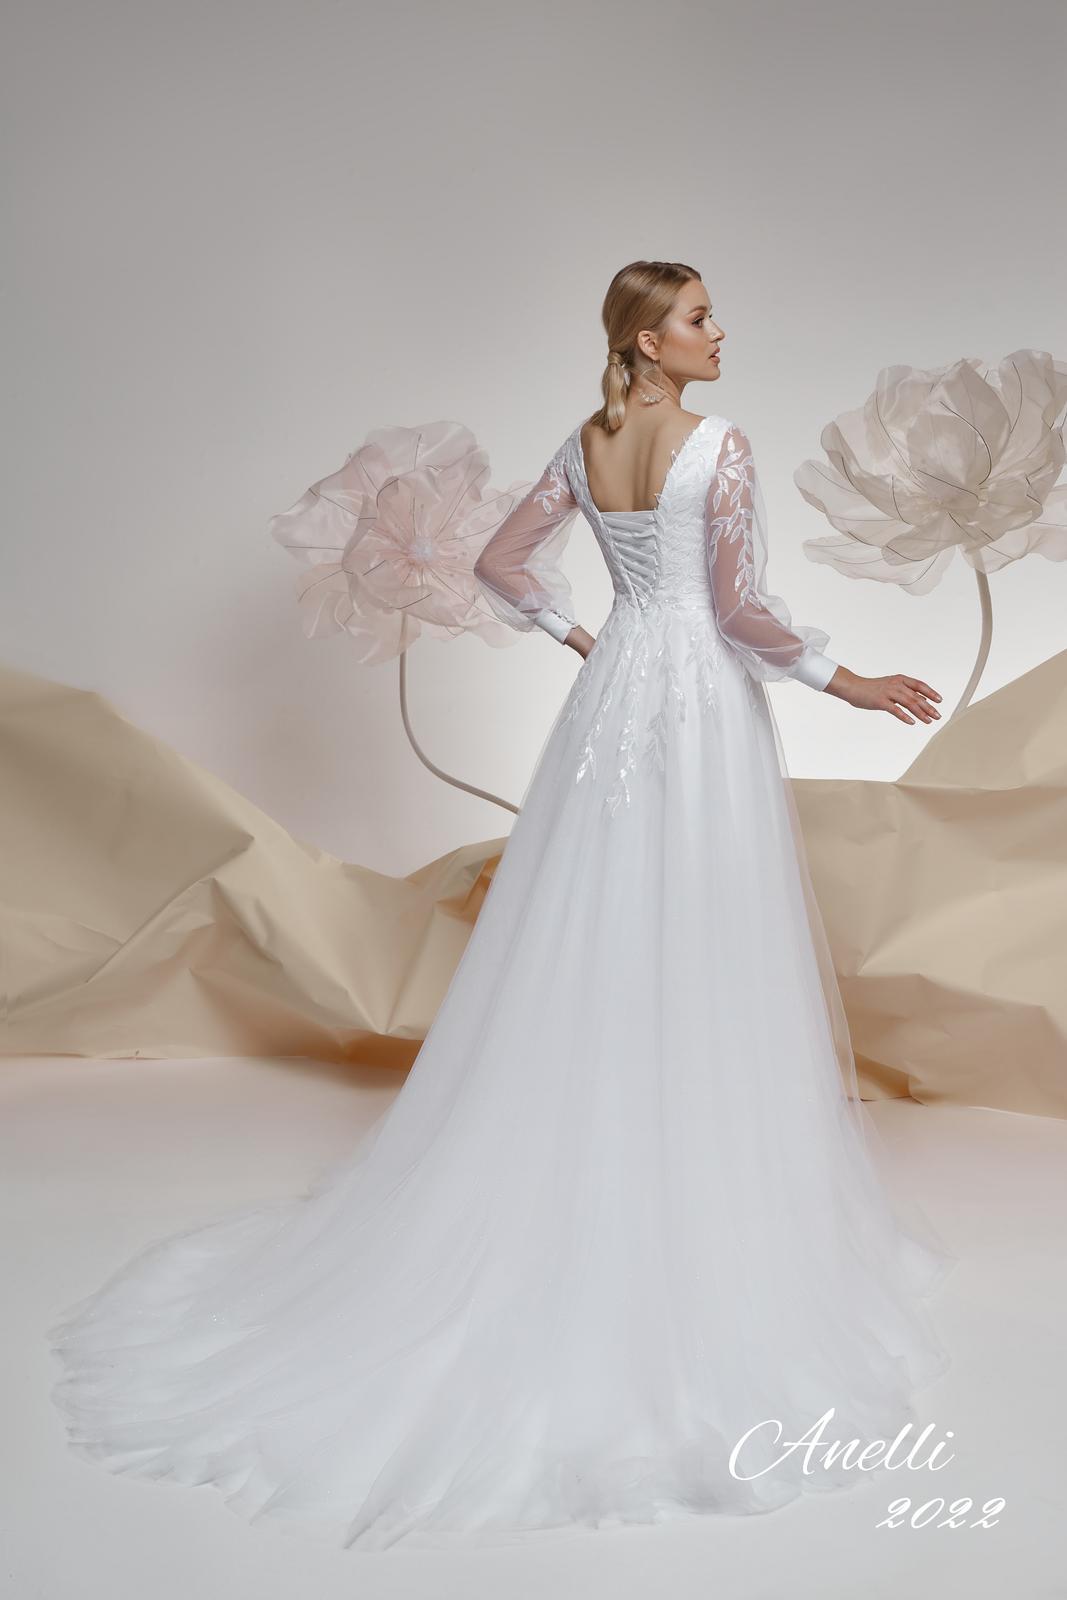 Svadobné šaty - Imagine 2022 - Obrázok č. 2